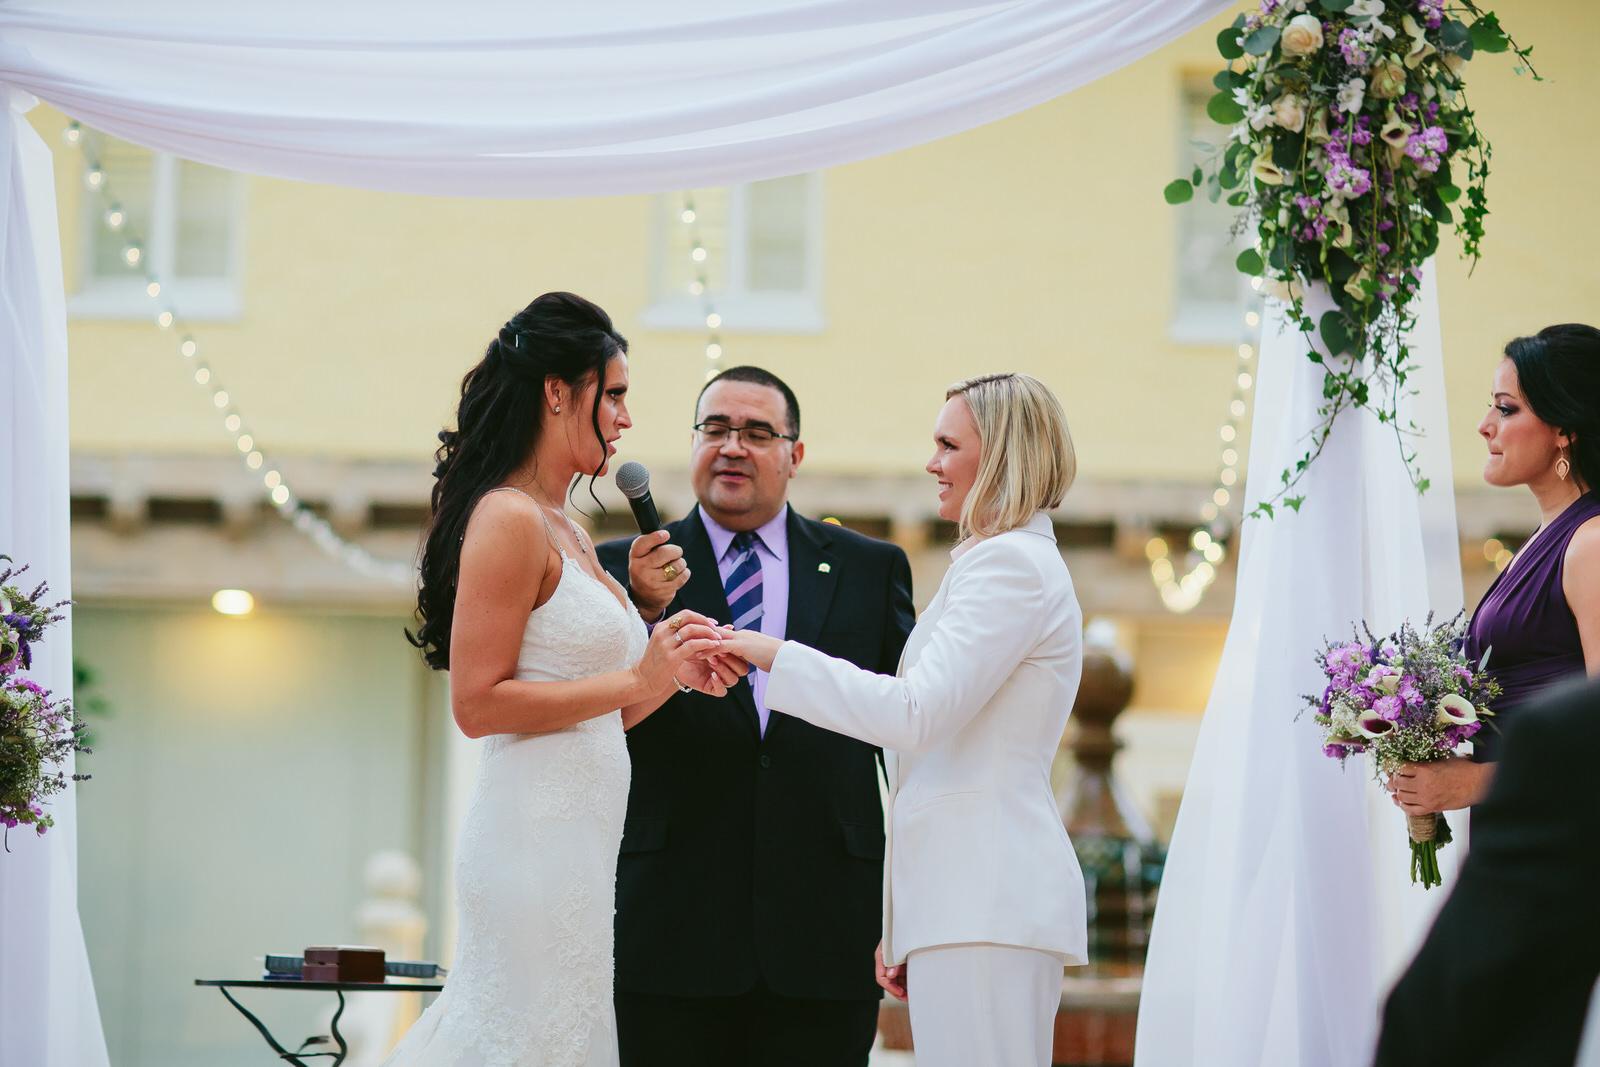 outdoor_wedding_ceremony_the_addison_boca_raton_tiny_house_photo.jpg